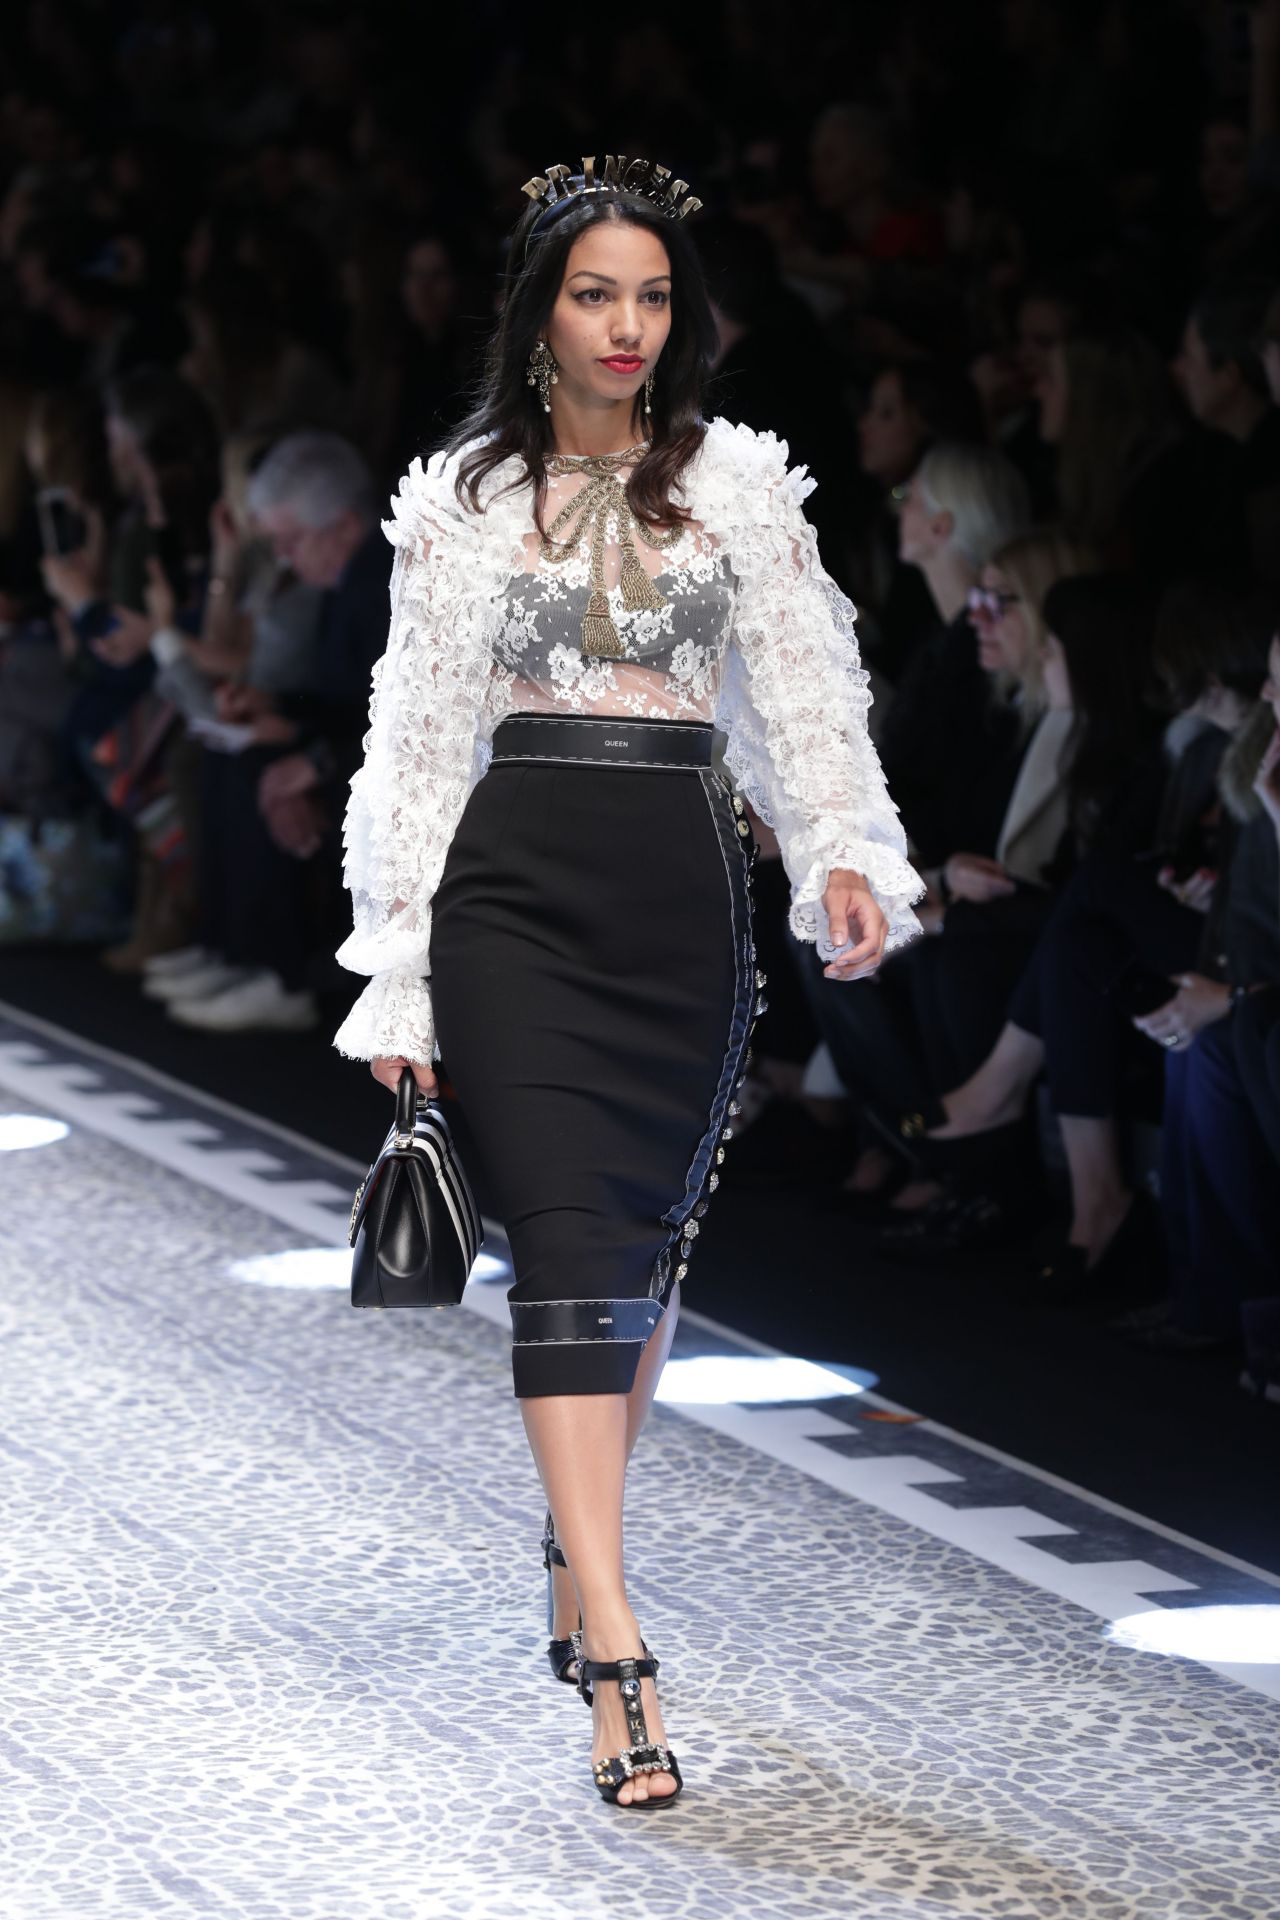 Corinne Foxx - Dolce Gabbana MFW Womens Runway in Milan, February 2017